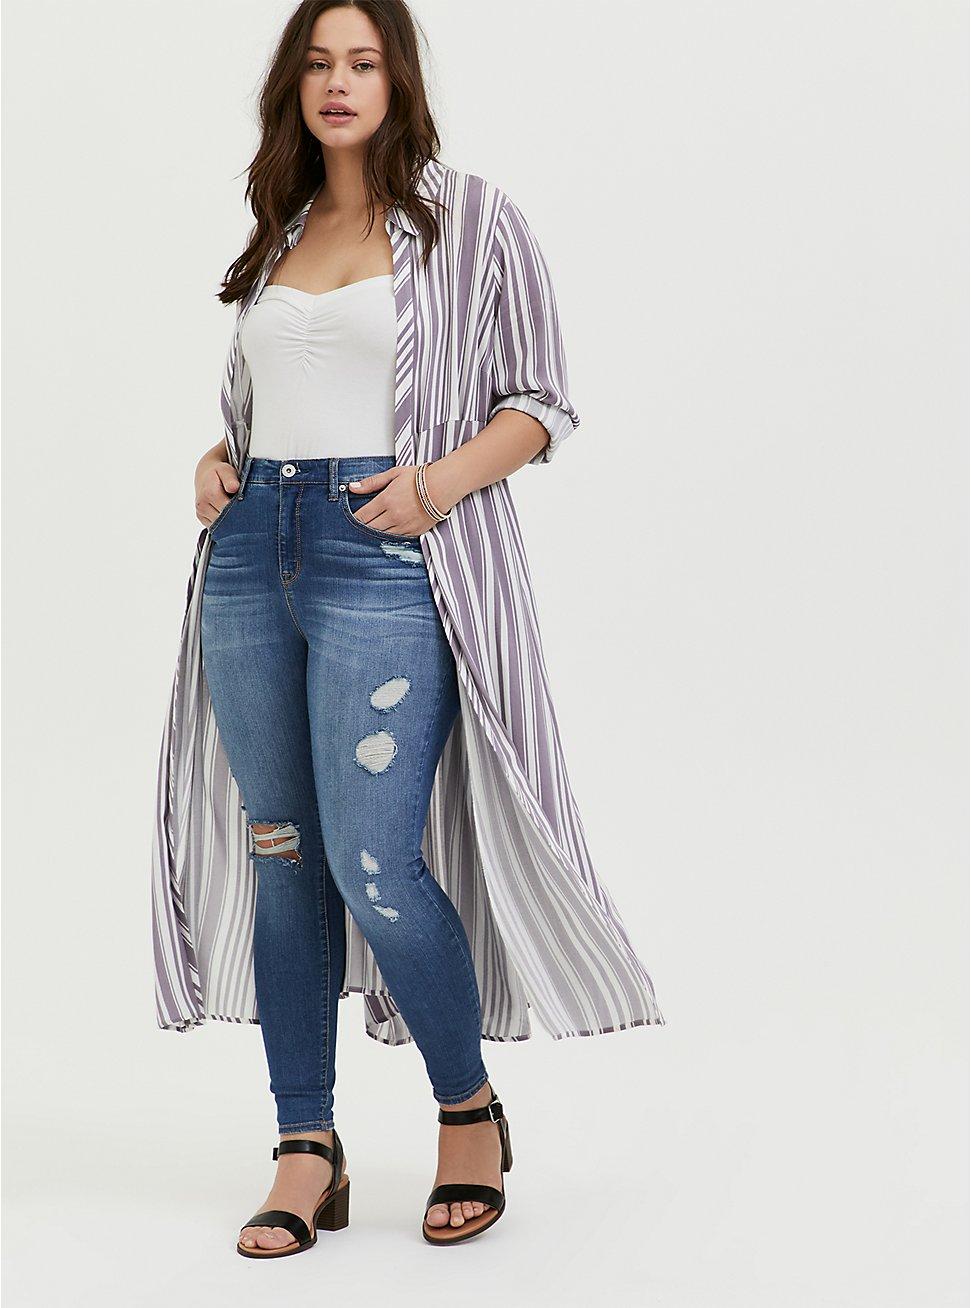 Slate Grey & White Stripe Challis Duster Shirt Kimono, STRIPES, hi-res